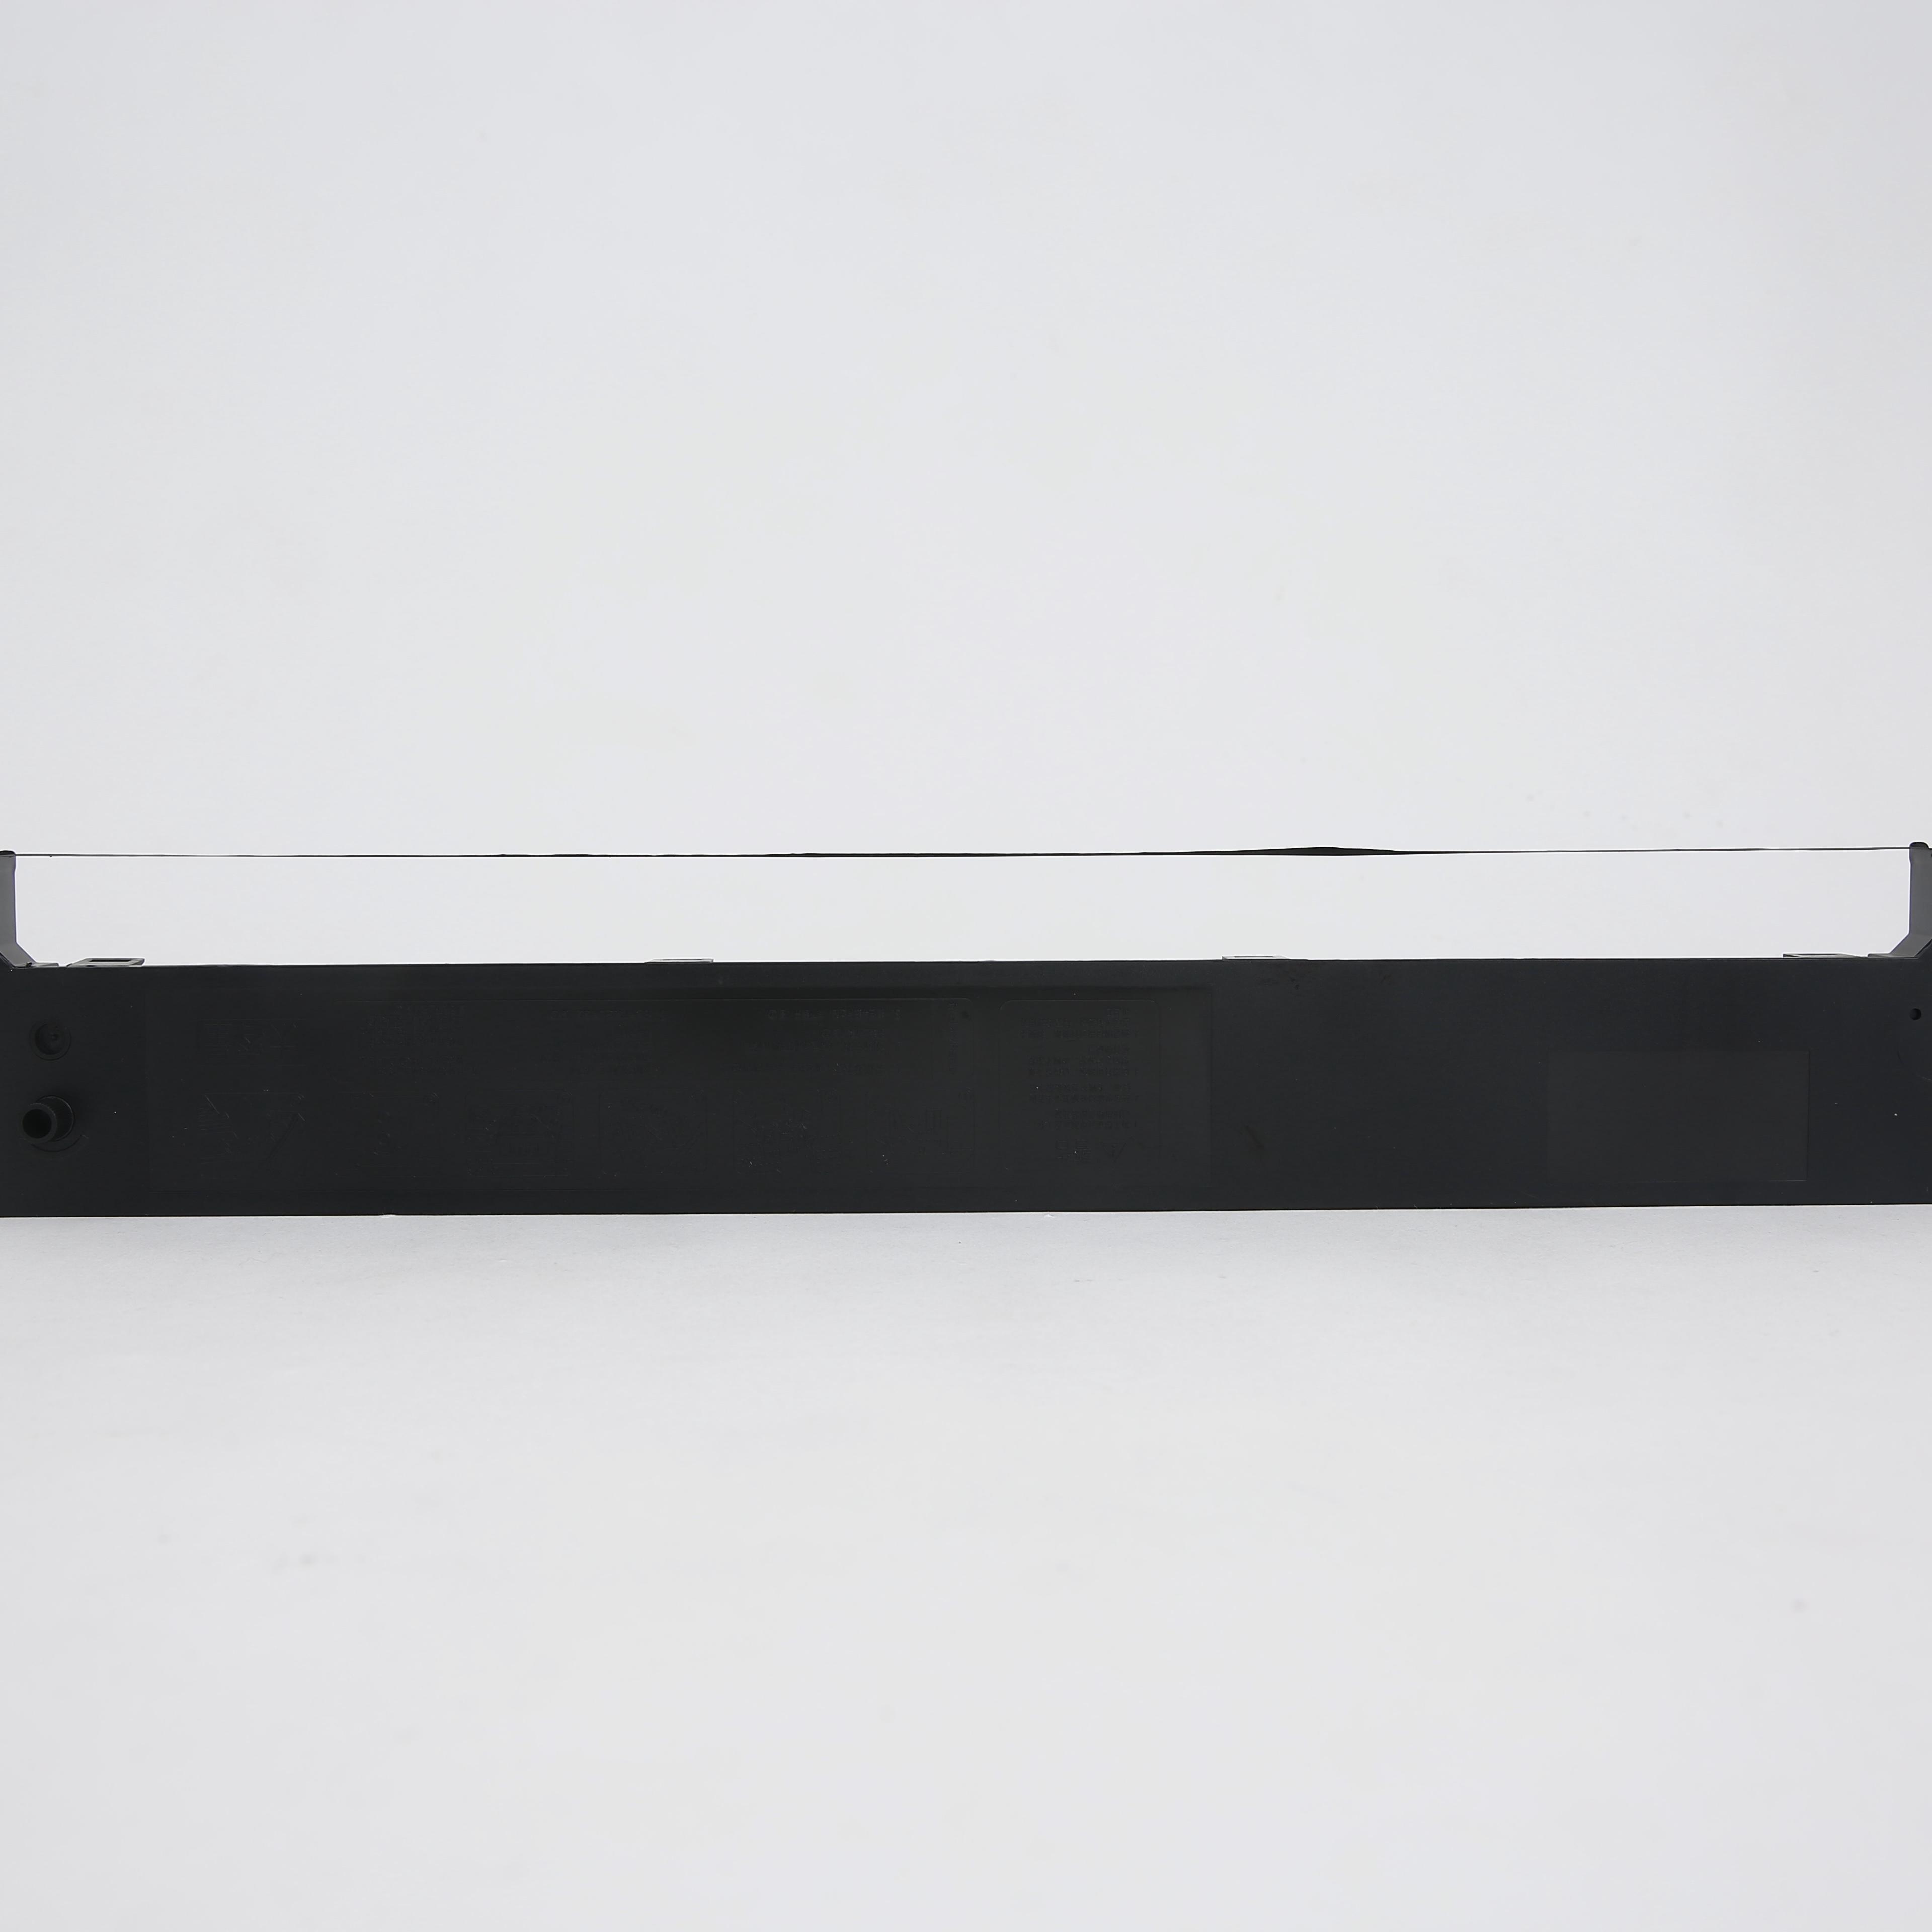 BP1000 of Compatible Replace Tape Printer Ribbon Cartridge